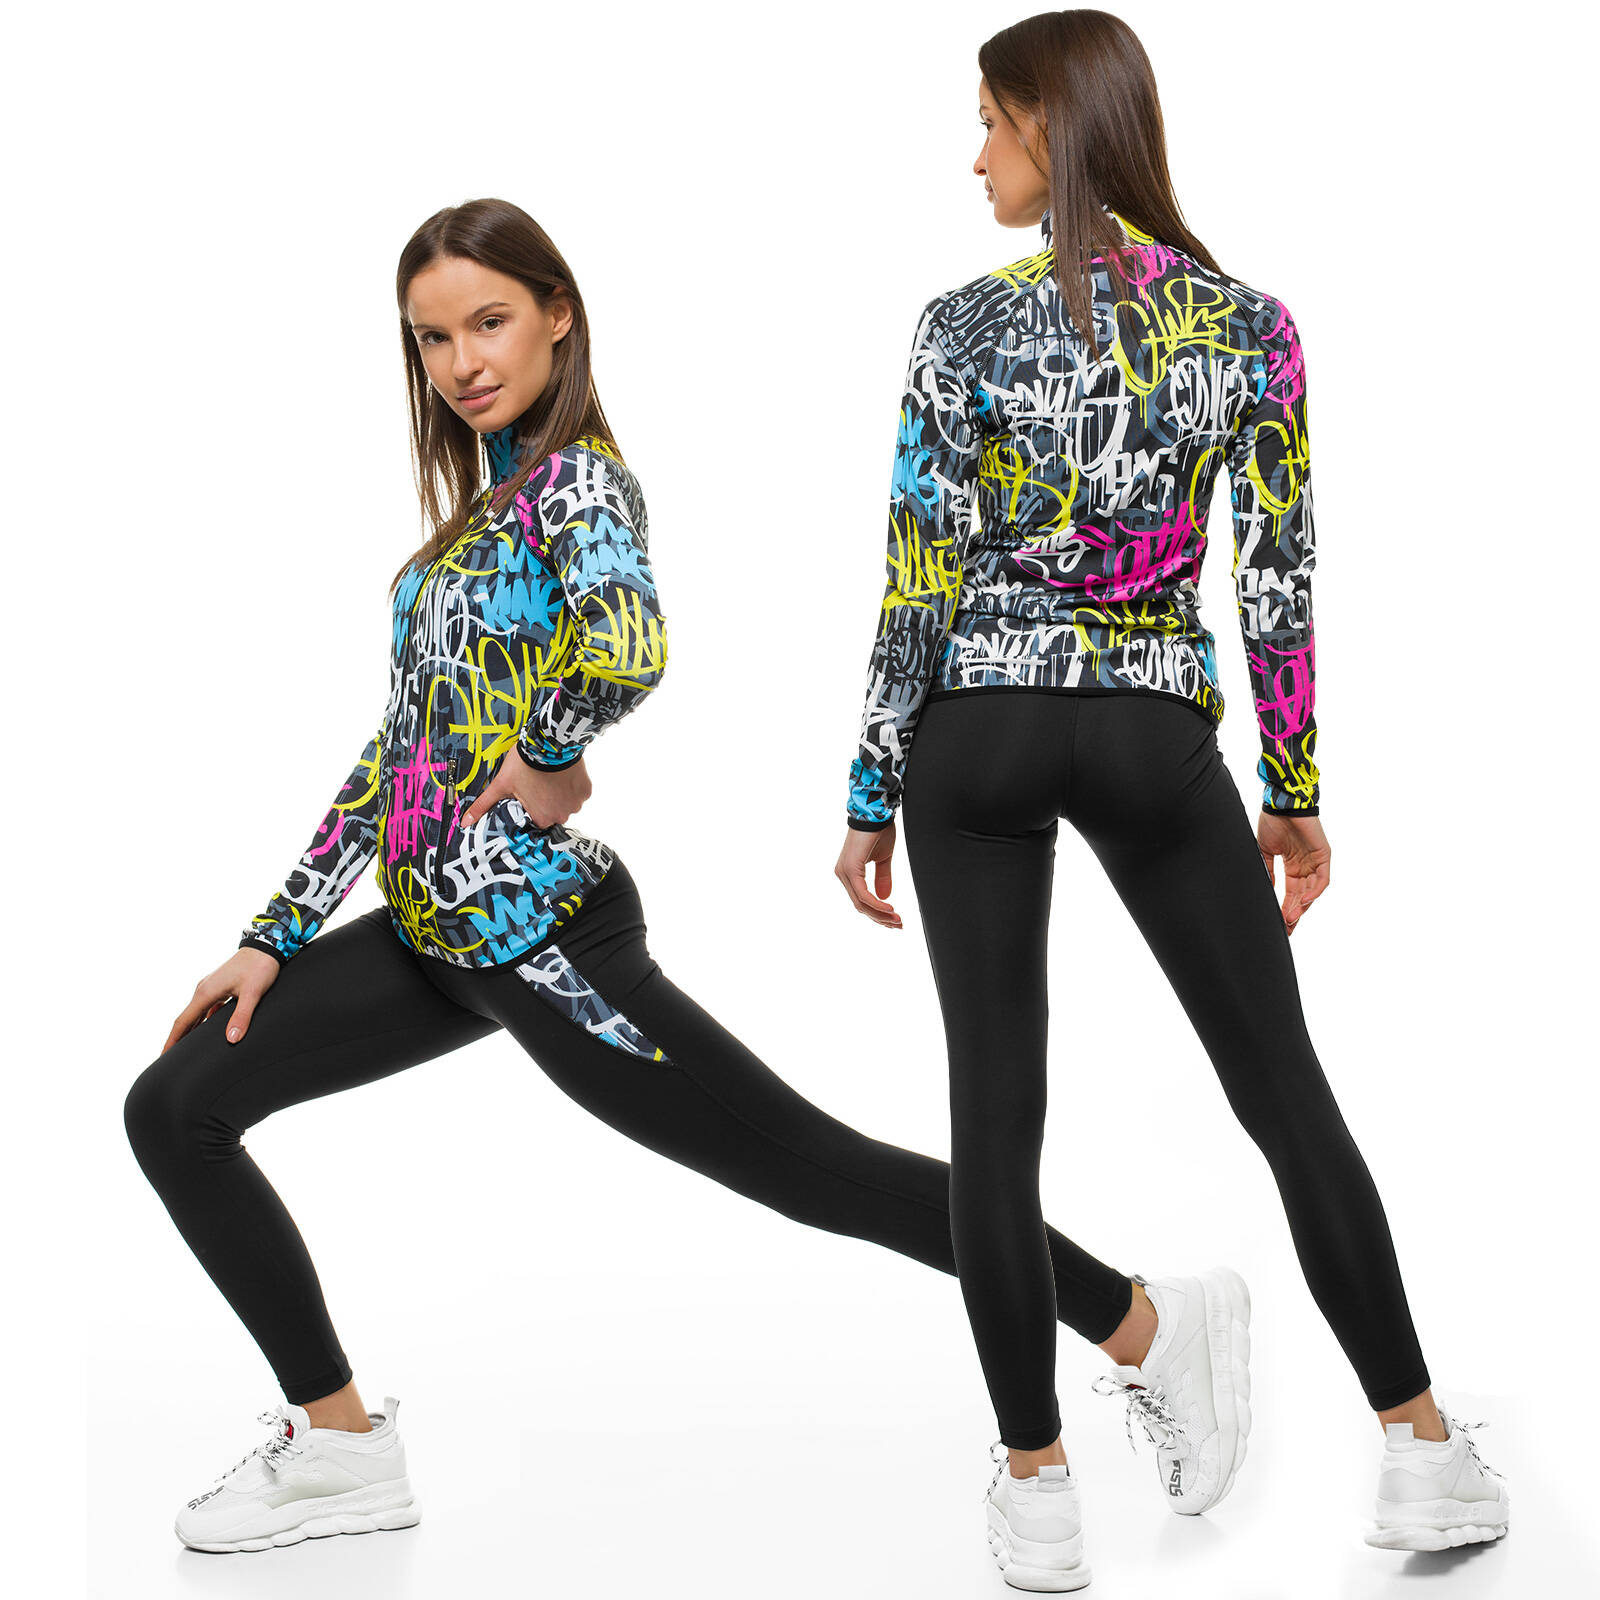 Trainingsanzug Sportanzug Jogginganzug Hose Sweatshirt Damen OZONEE 14535 MIX